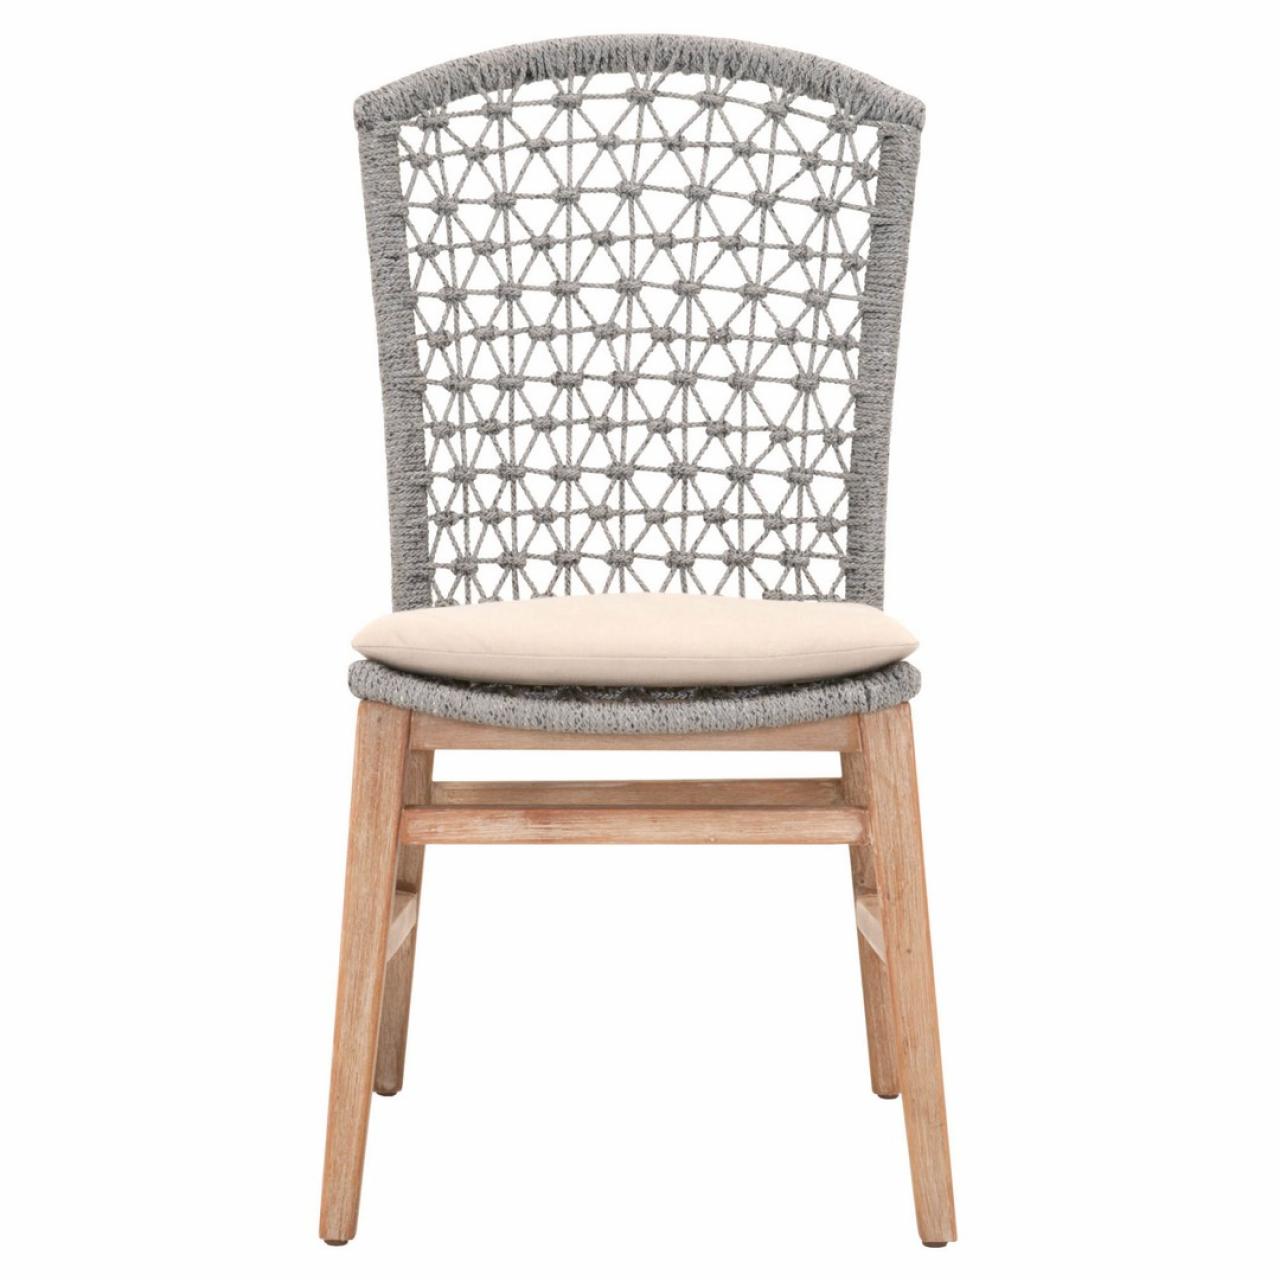 Lace+Dining+Chair+-+Platinum+-+1.jpg